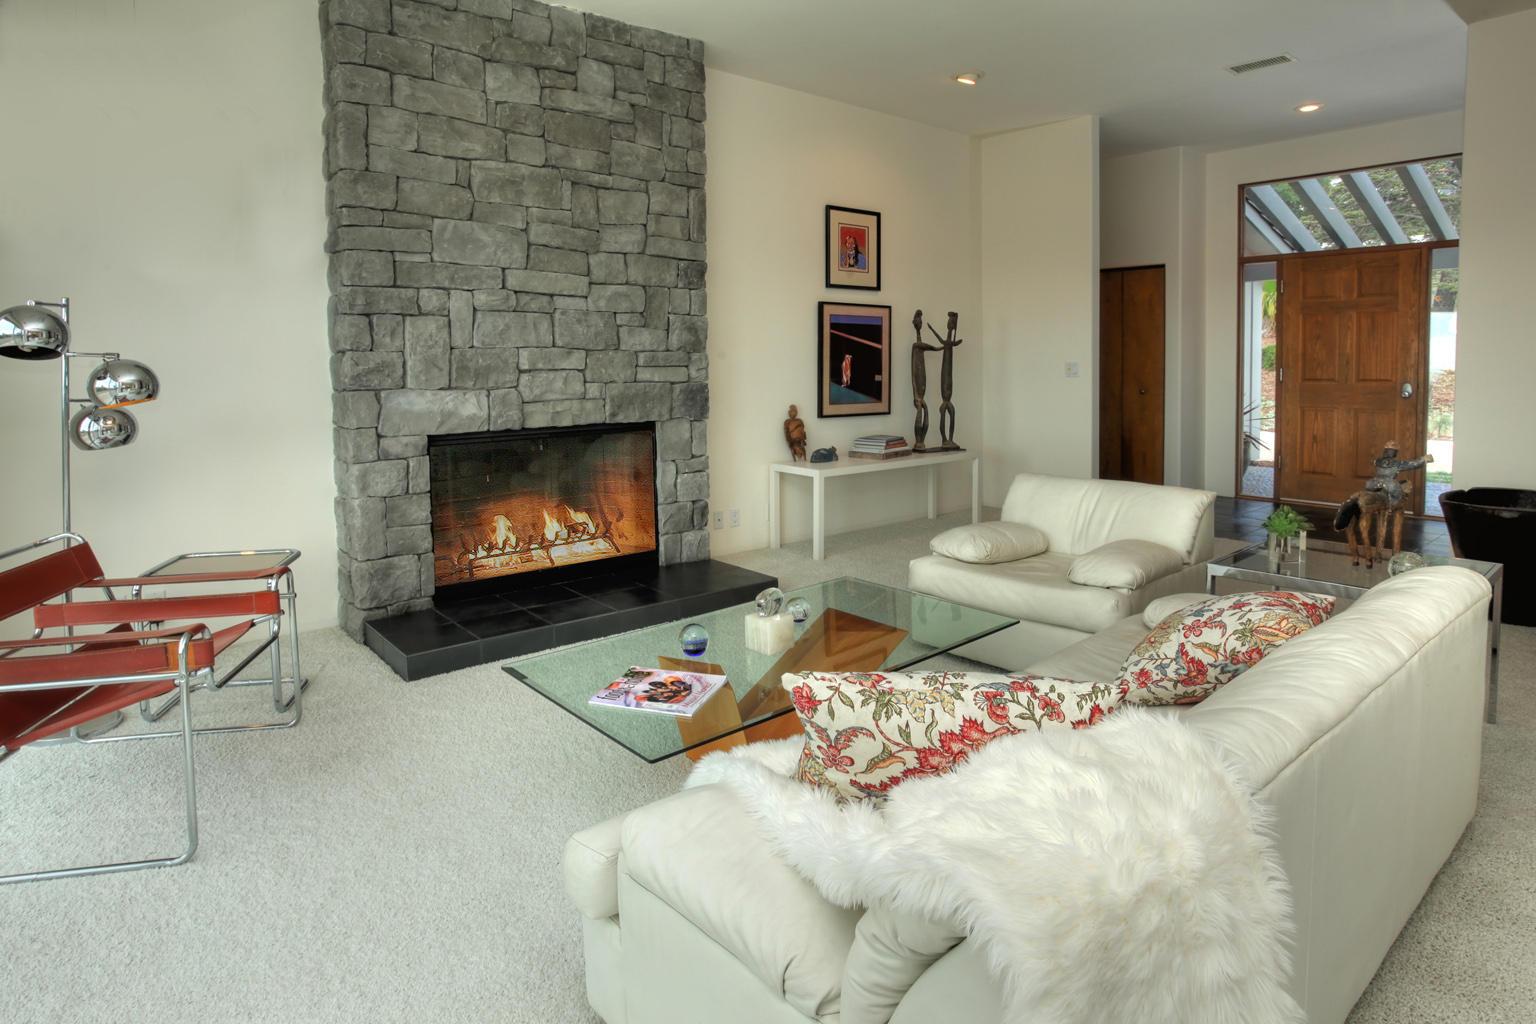 Property photo for 1440 Twinridge Rd Santa Barbara, California 93111 - 15-593